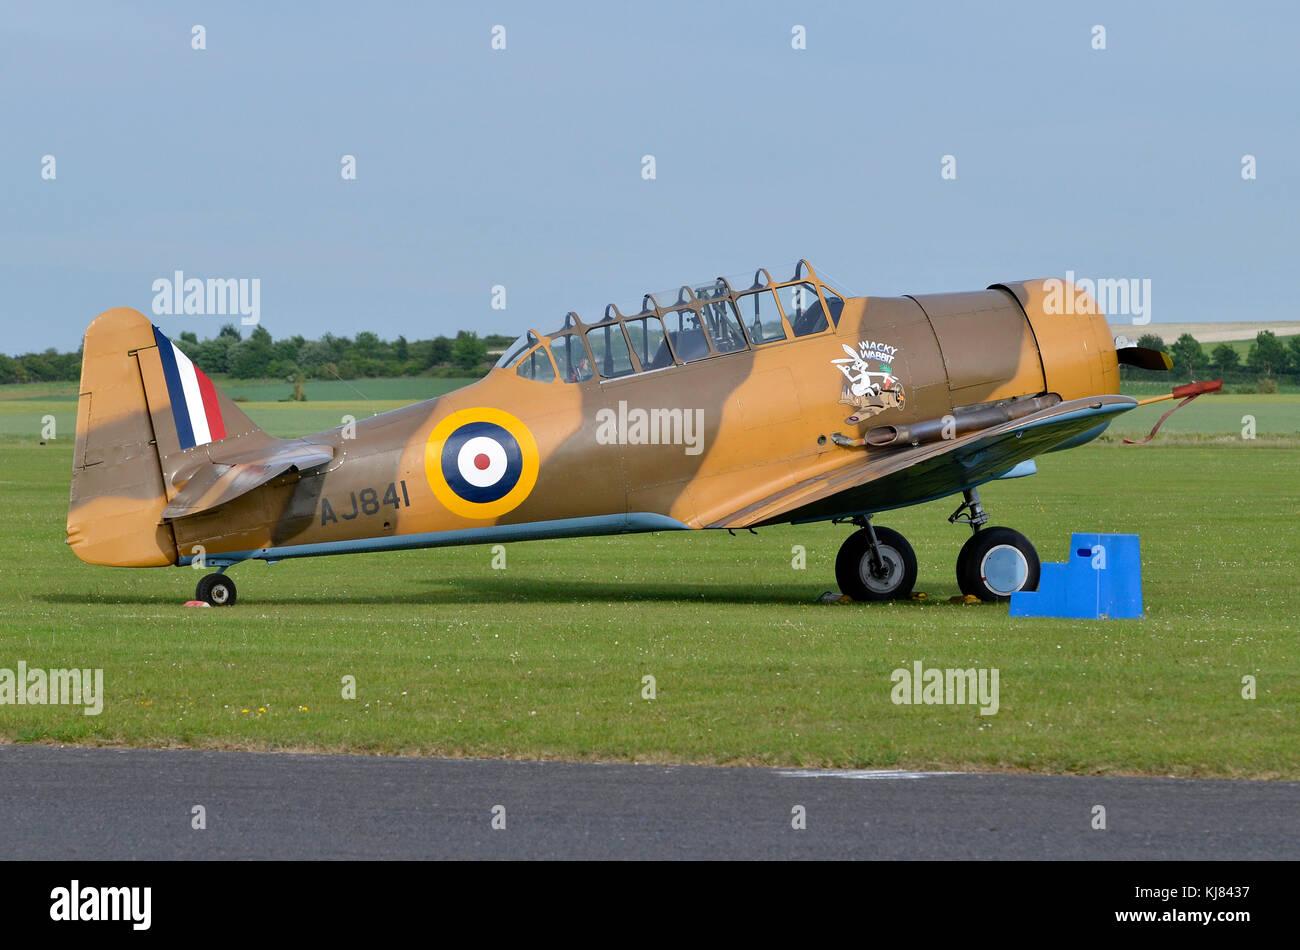 North American T-6 Texan, Wacky Wabbit, RAF colours, Duxford, UK. - Stock Image